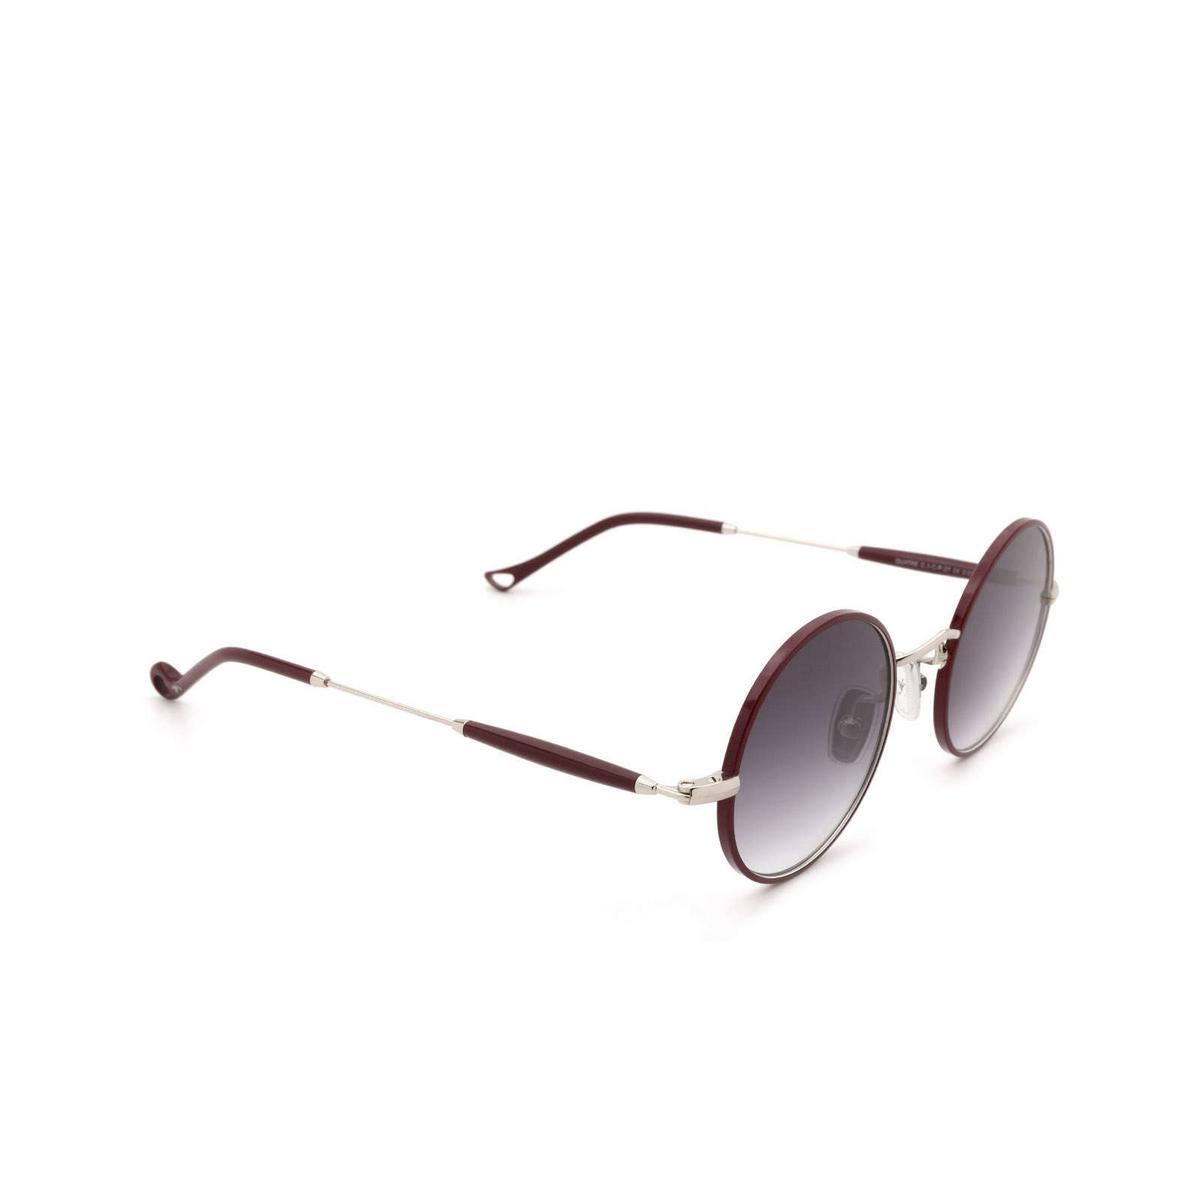 Eyepetizer® Round Sunglasses: Quatre color Bordeaux C.1-C-P-27 - three-quarters view.